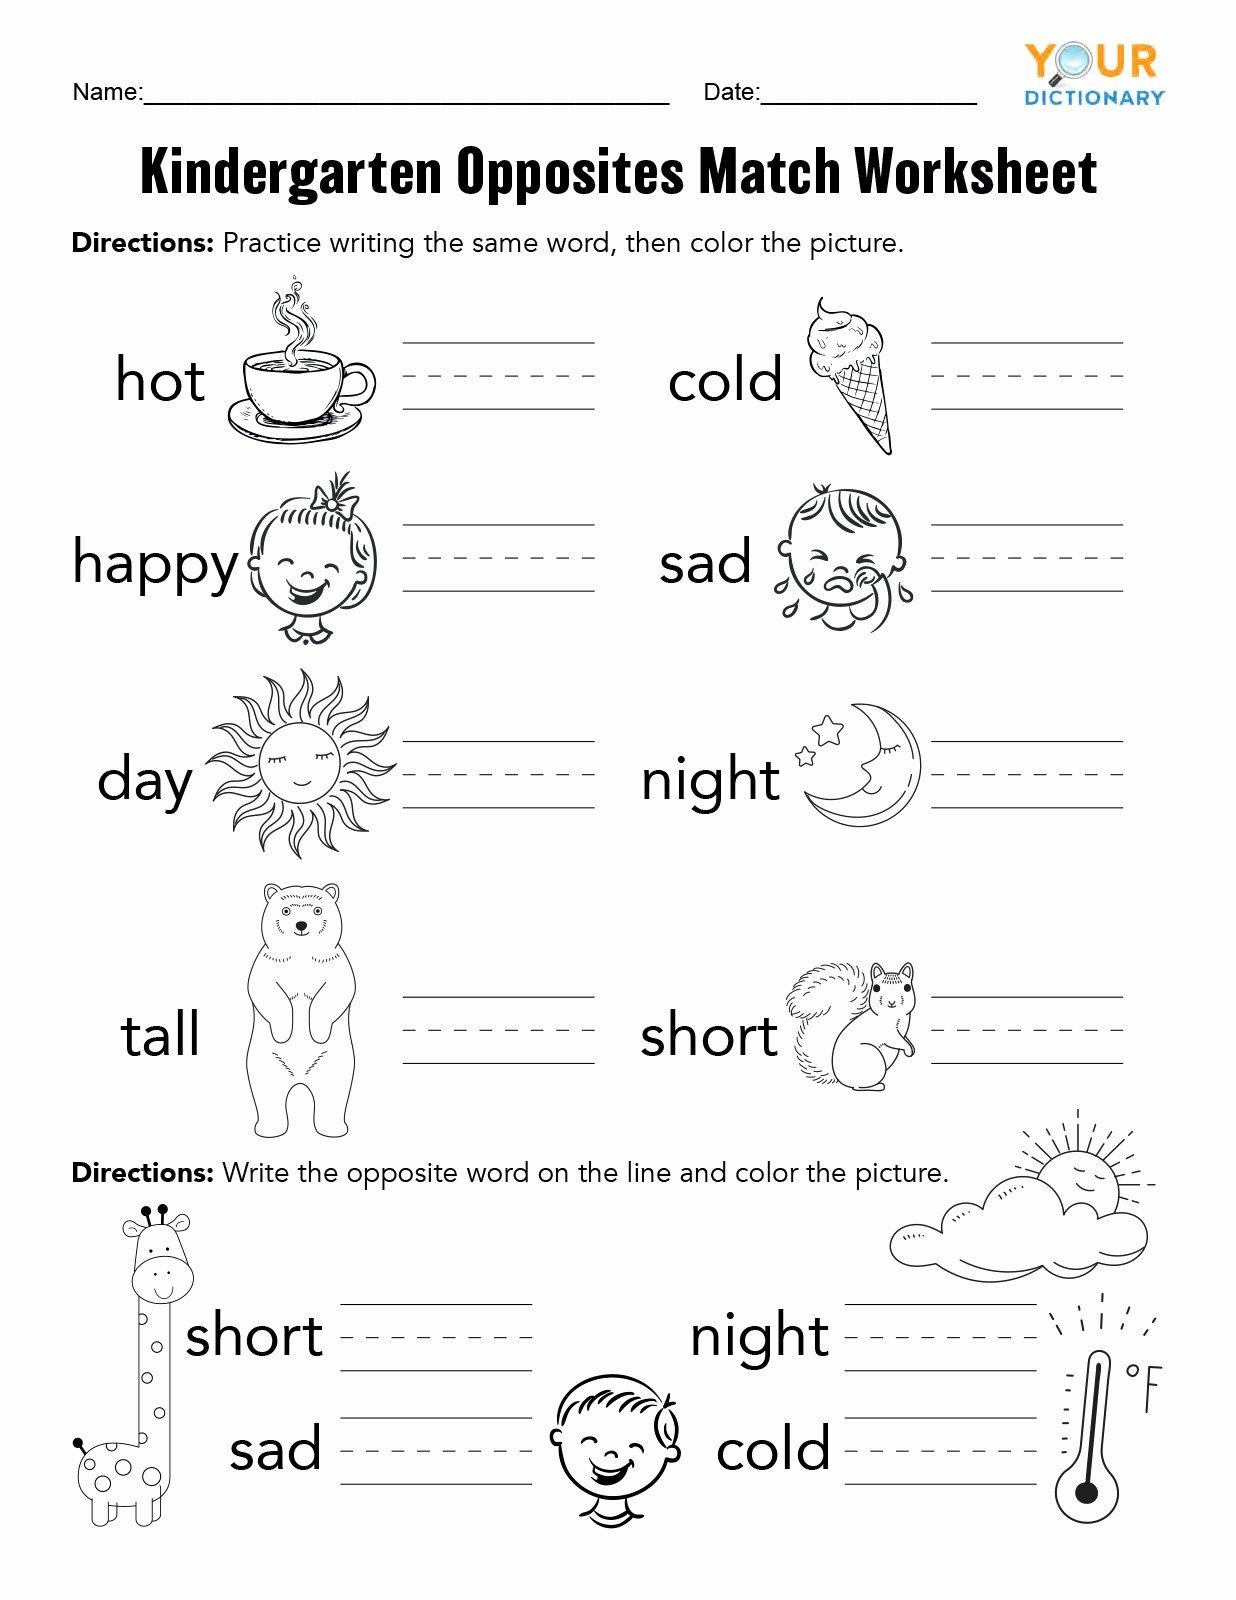 Opposite Worksheets for Preschoolers Inspirational Math Worksheet Kindergarten Opposites Worksheet Language